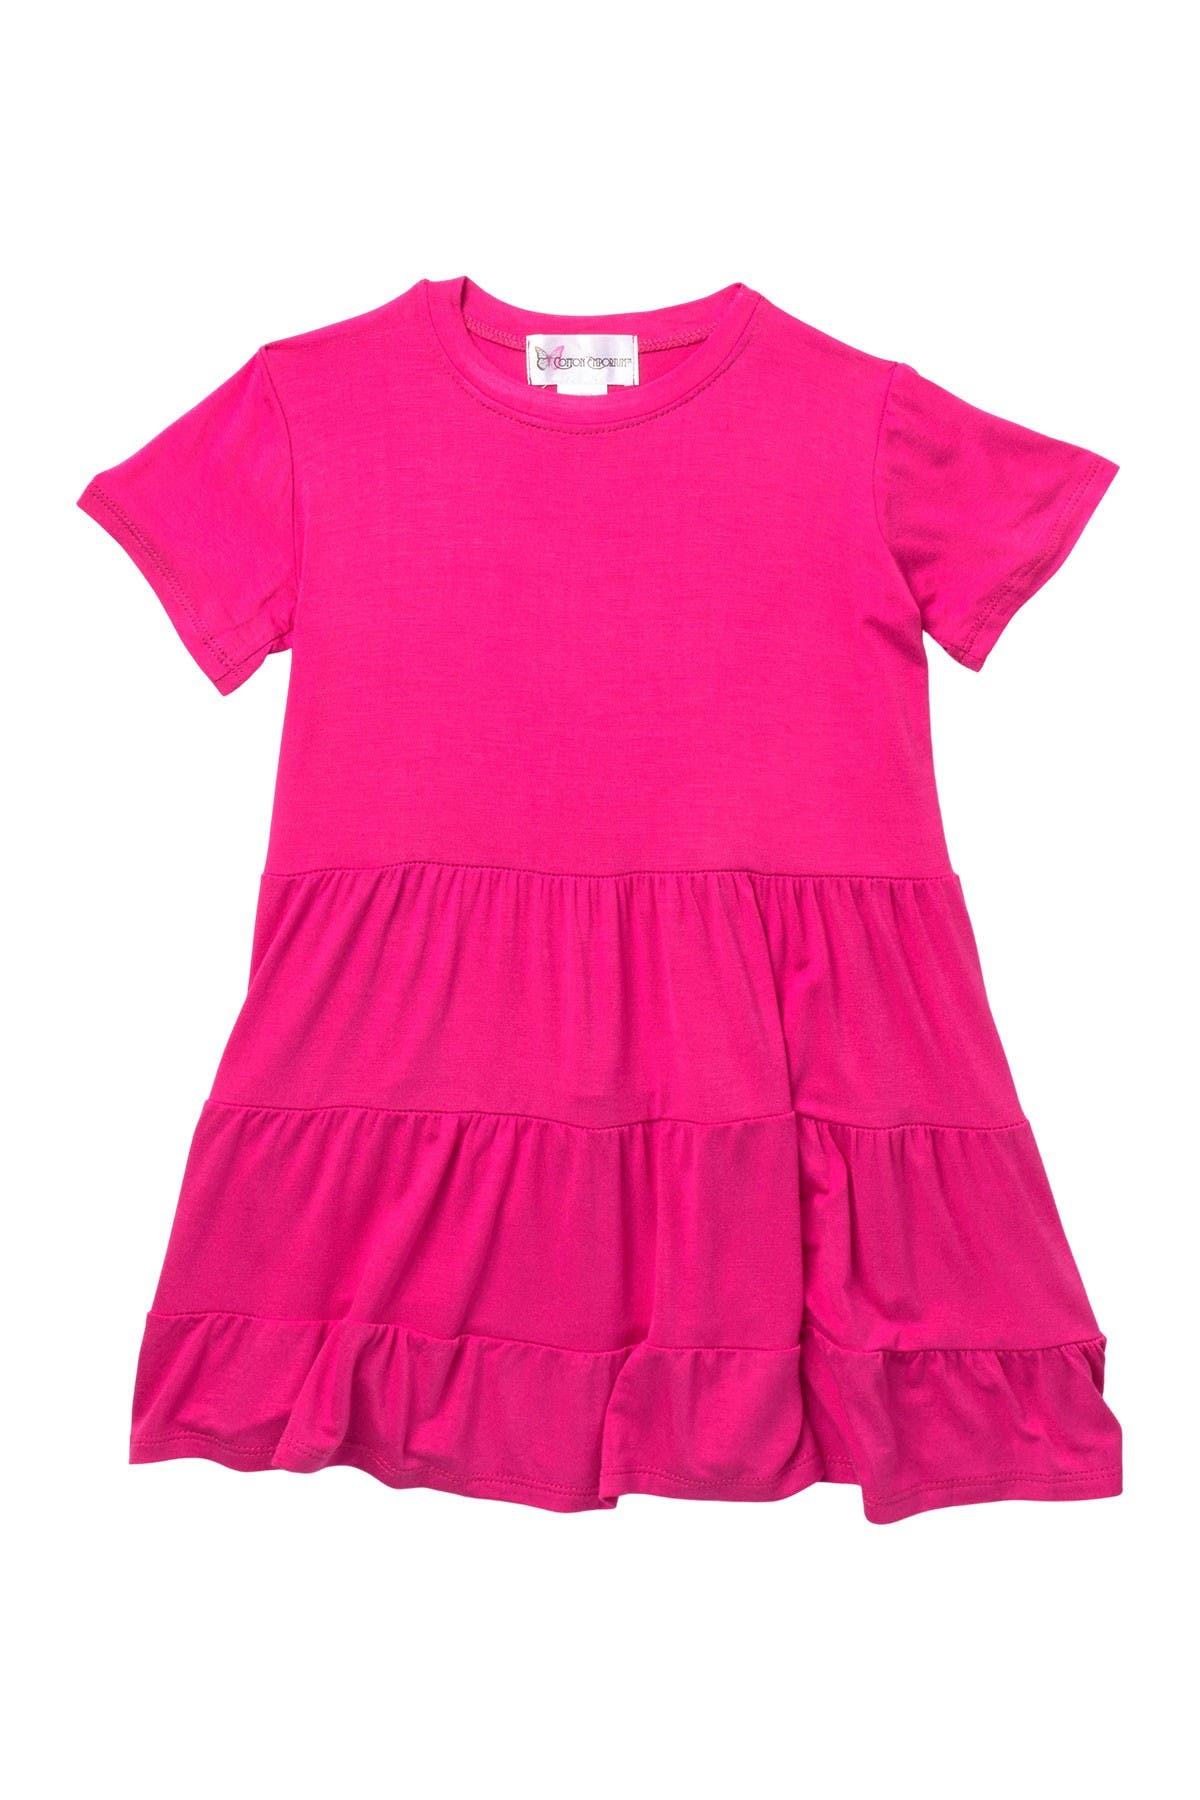 Image of Cotton Emporium Tiered Short Sleeve Dress